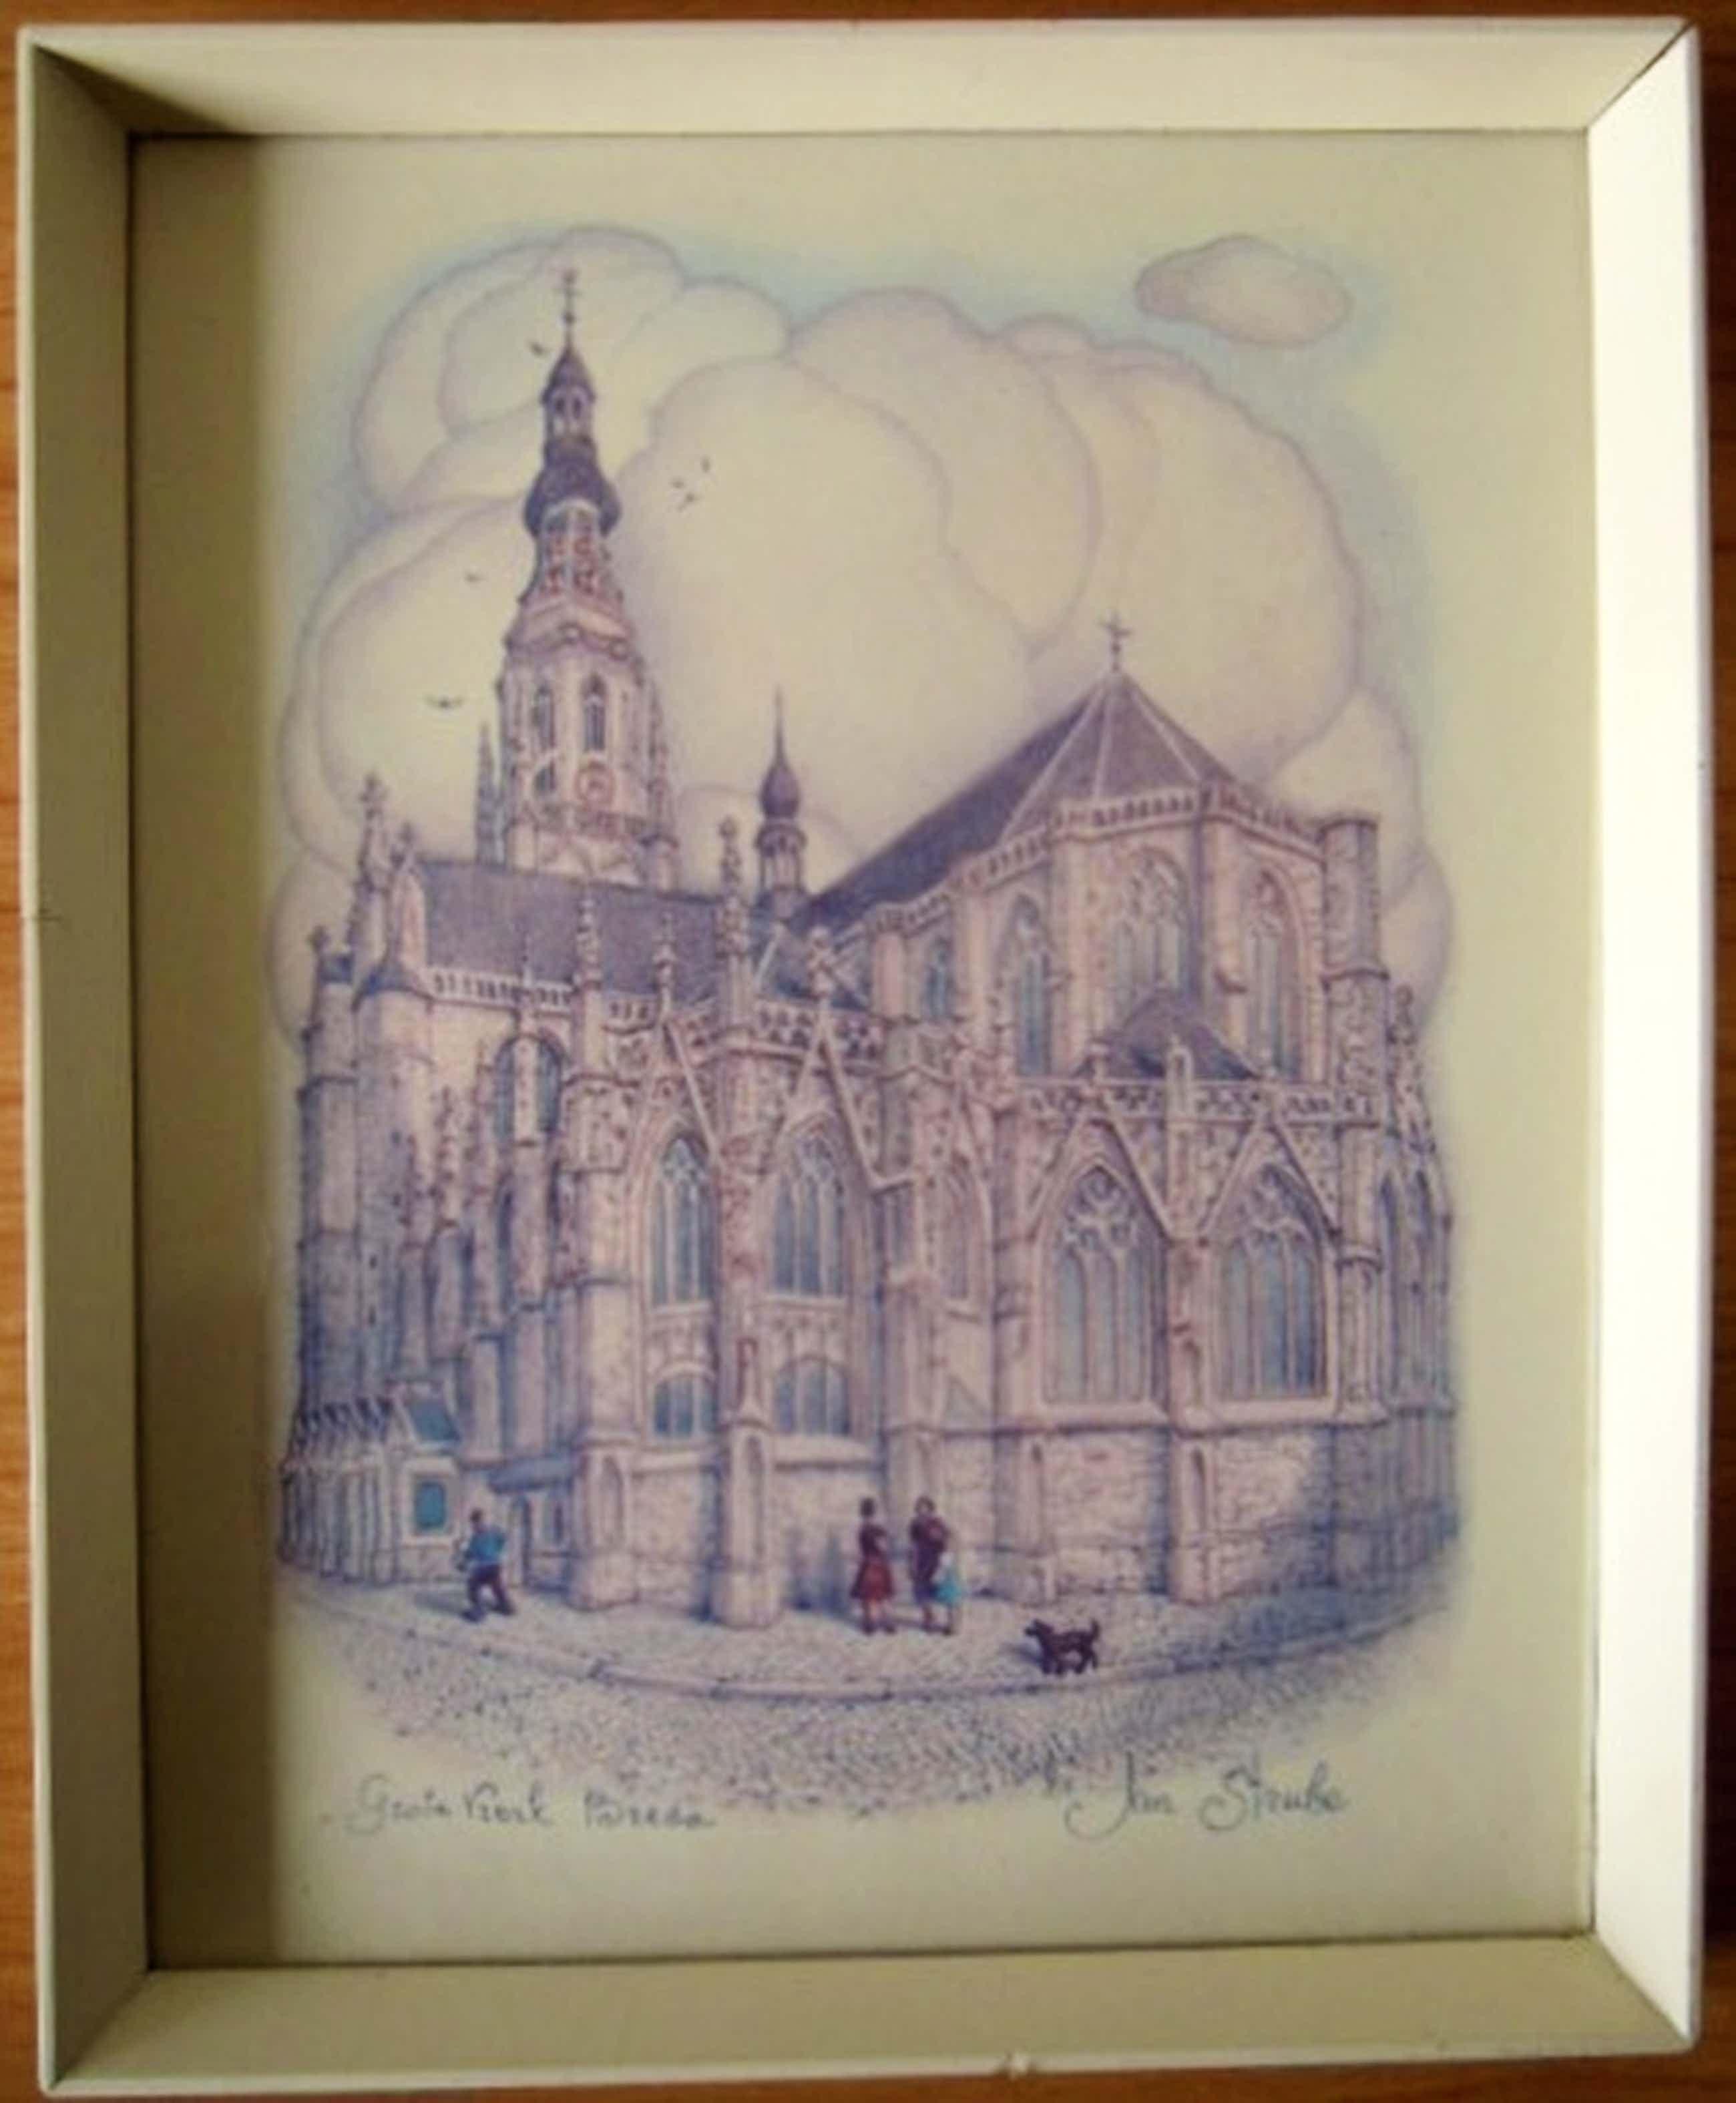 JAN STRUBE druk van grote kerk in Breda-hand gesigneerd   kopen? Bied vanaf 45!